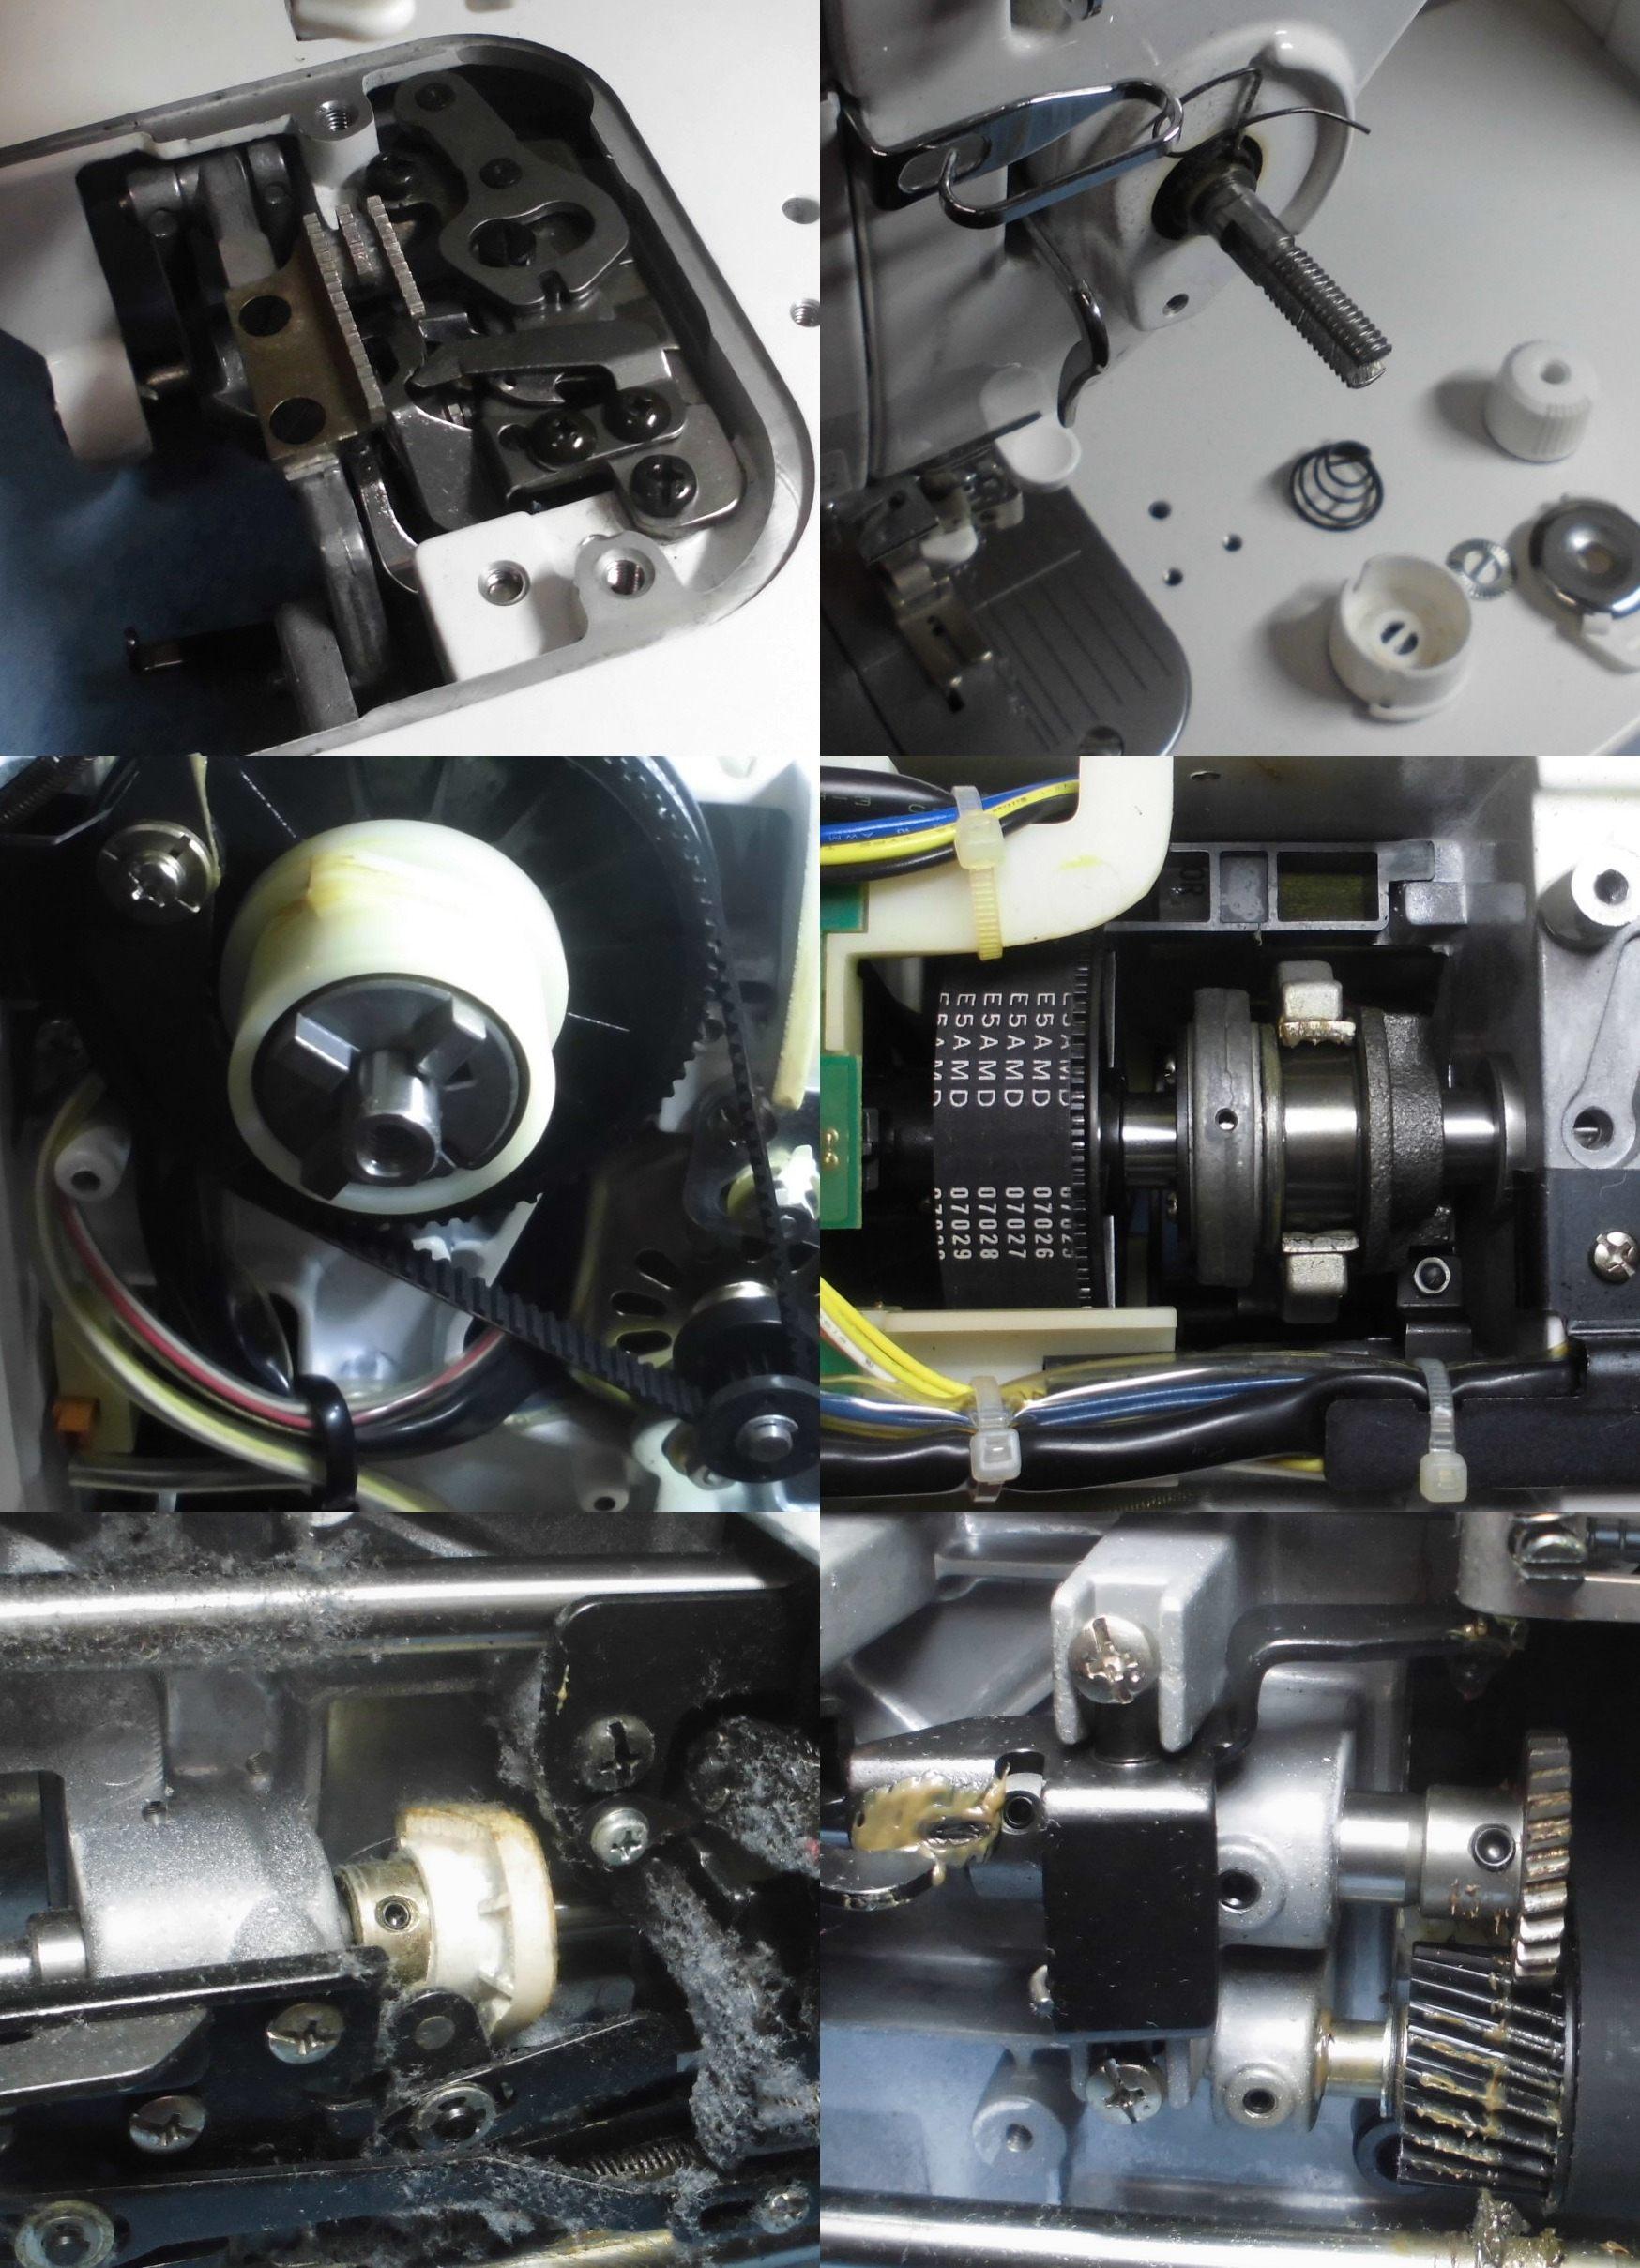 TL-25DXの全体オーバーホールメンテナンス修理|ジューキミシン|SPUR25deluxe